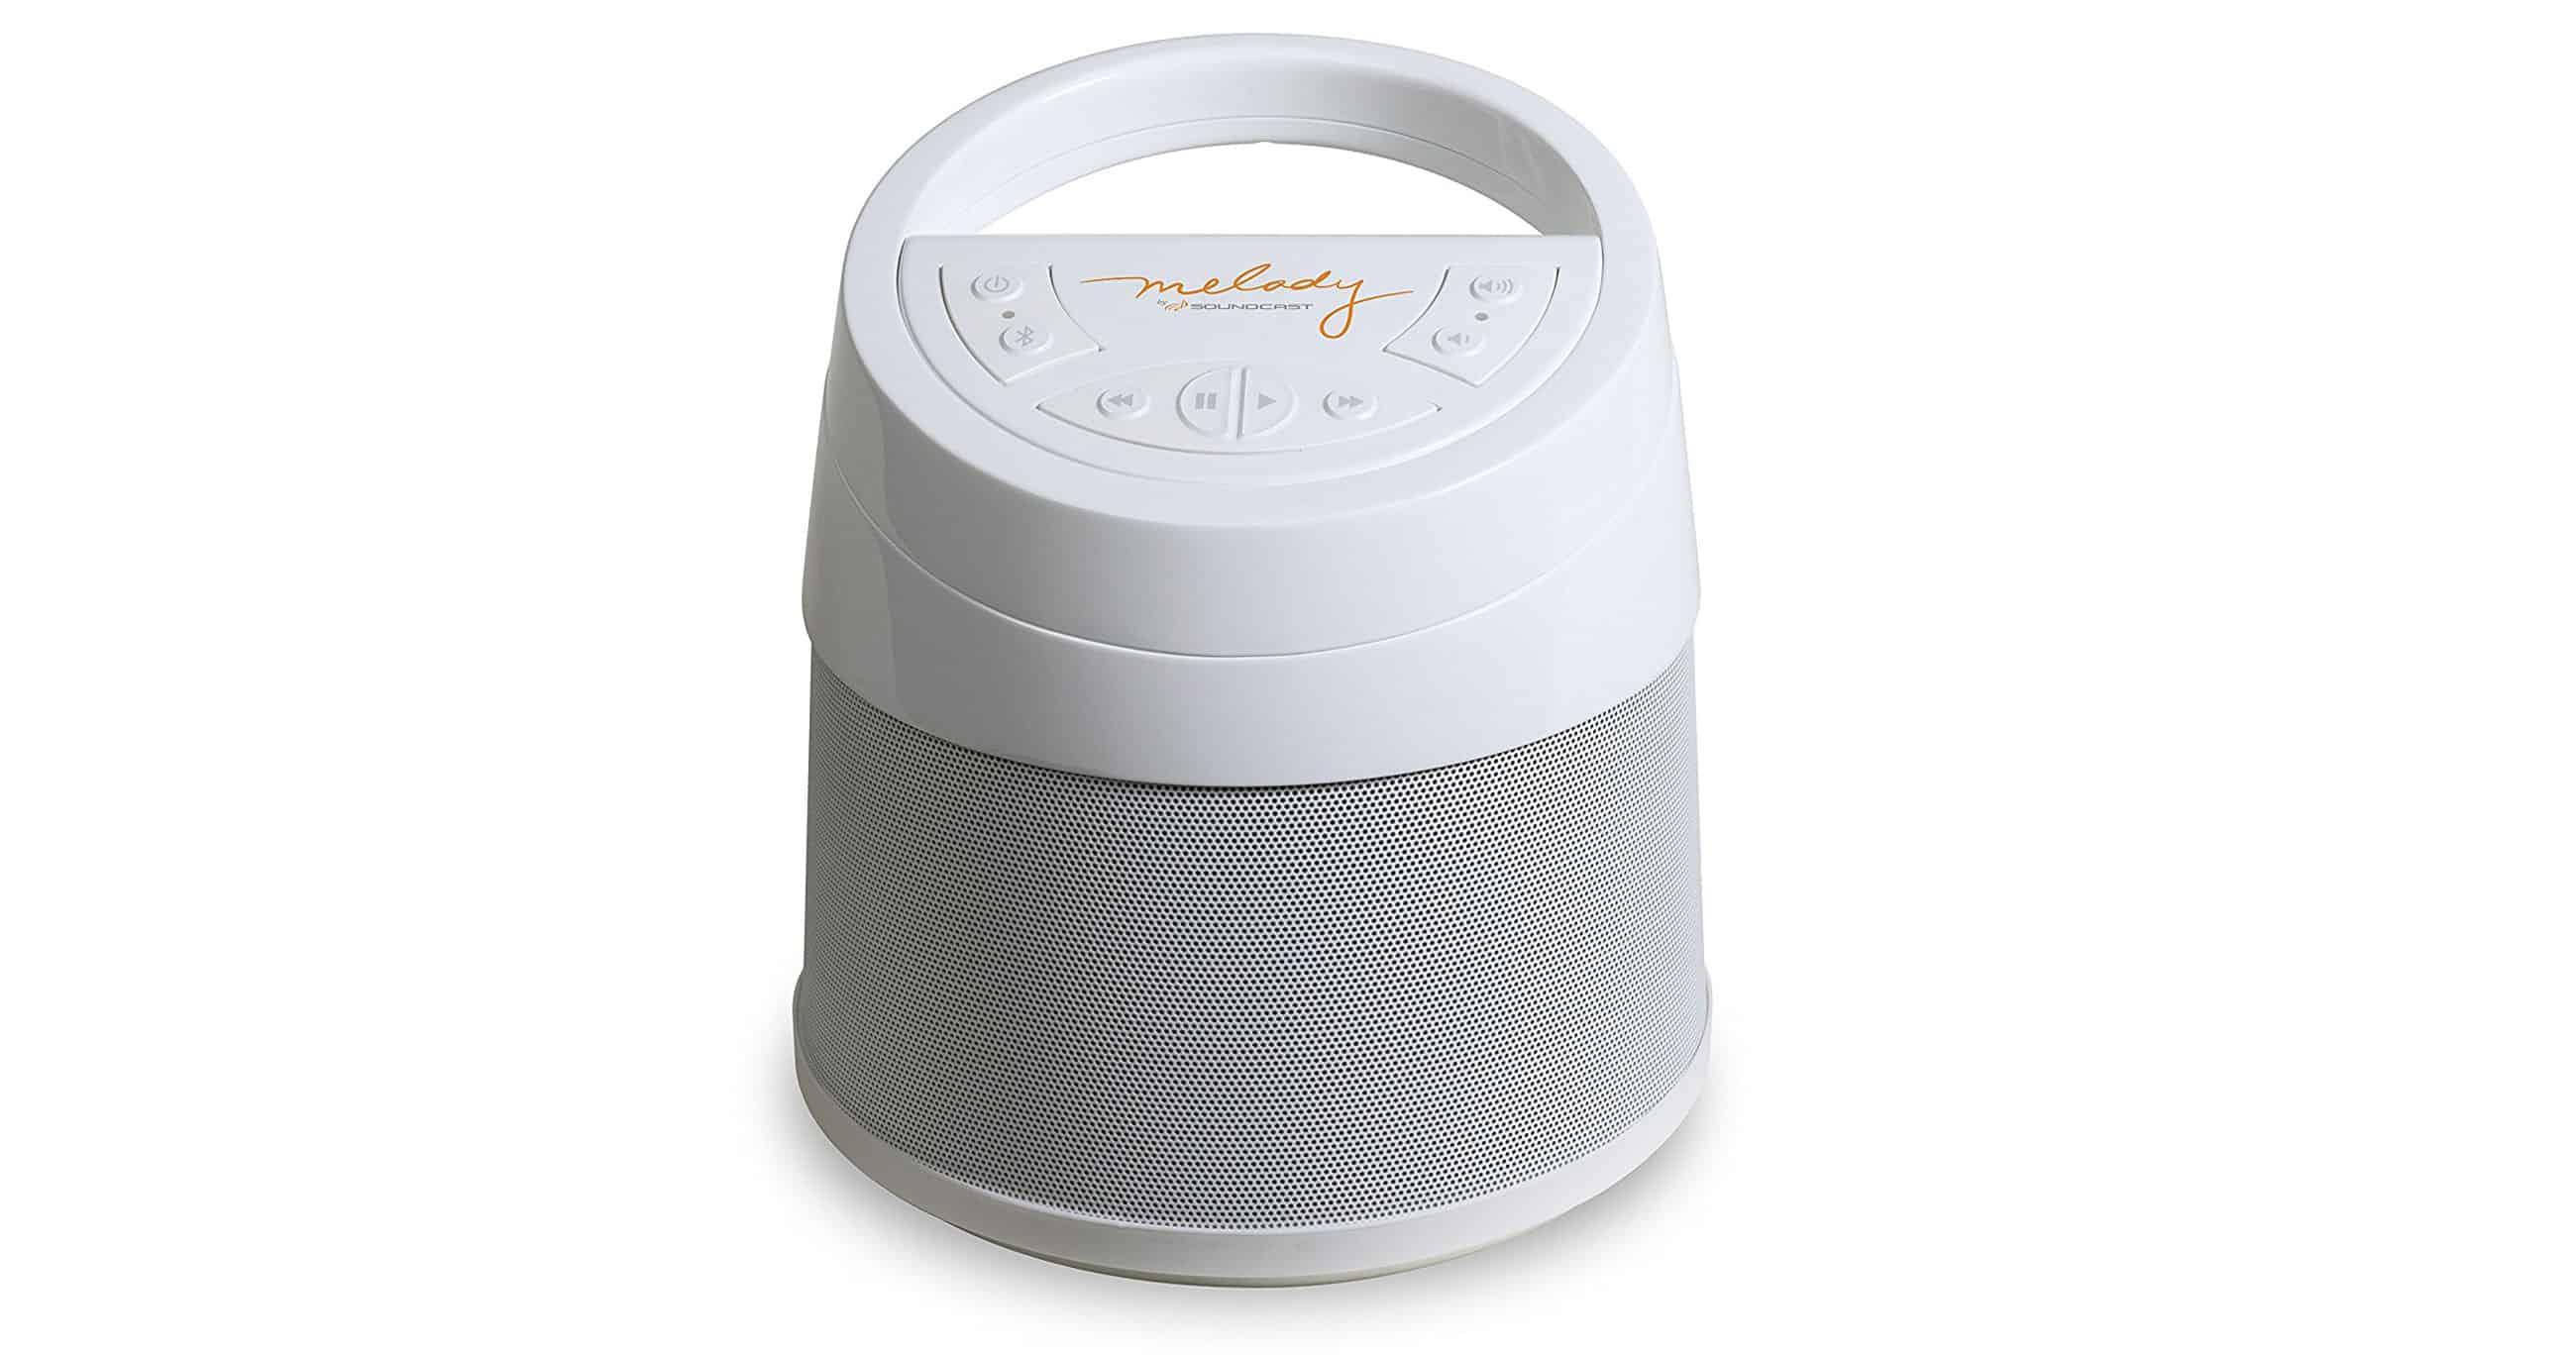 Soundcast Melody Speaker Portable White Background